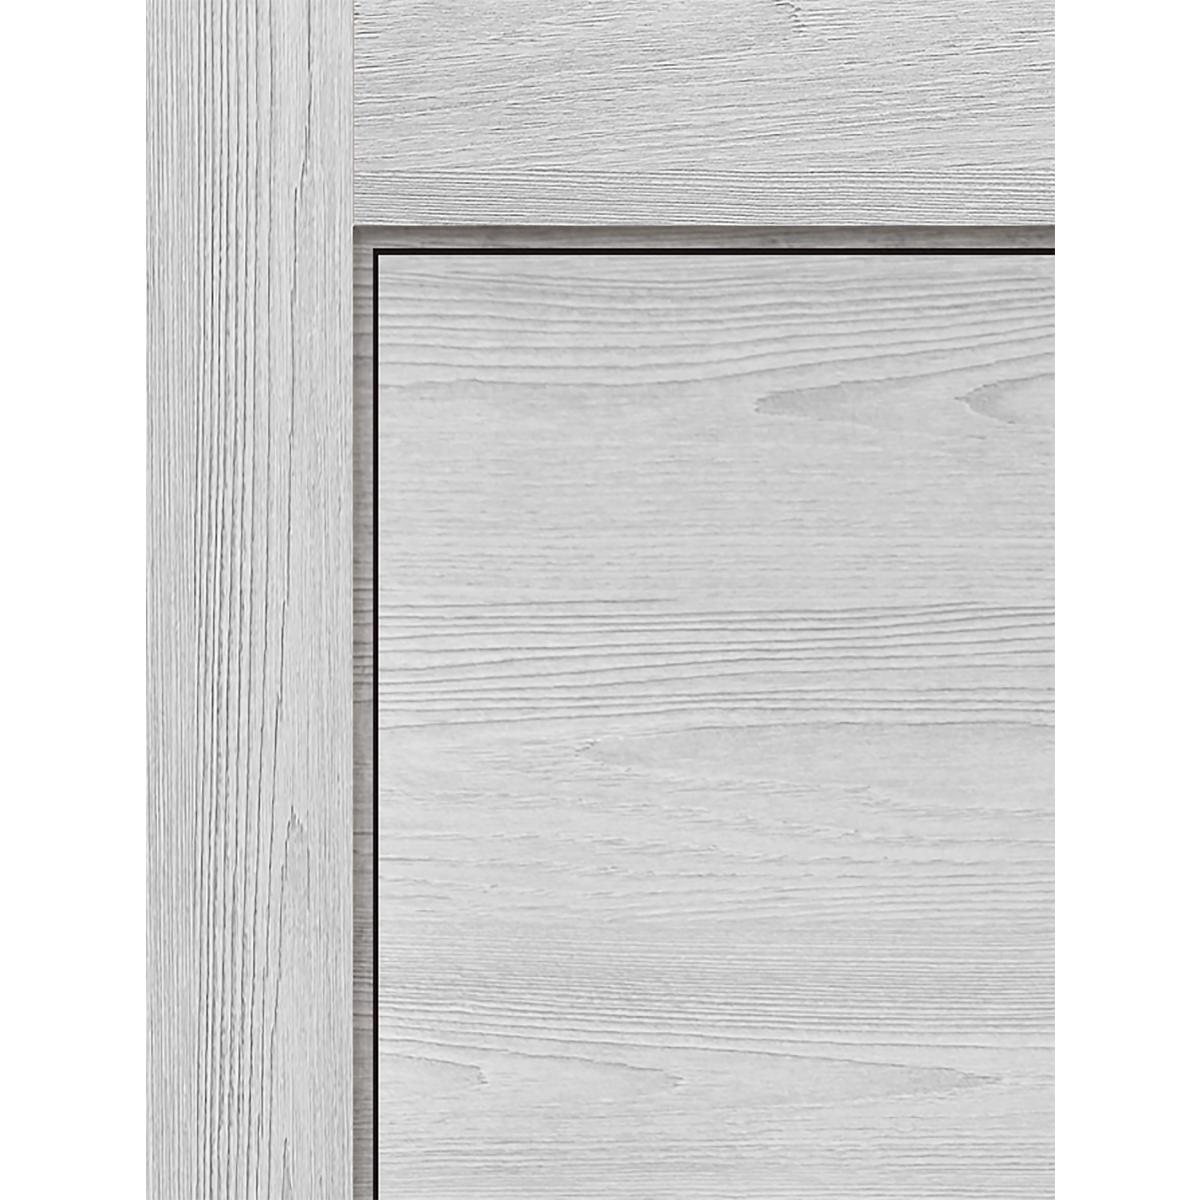 Дверь Межкомнатная Глухая 90x200 Ламинация Цвет Ясень Серый